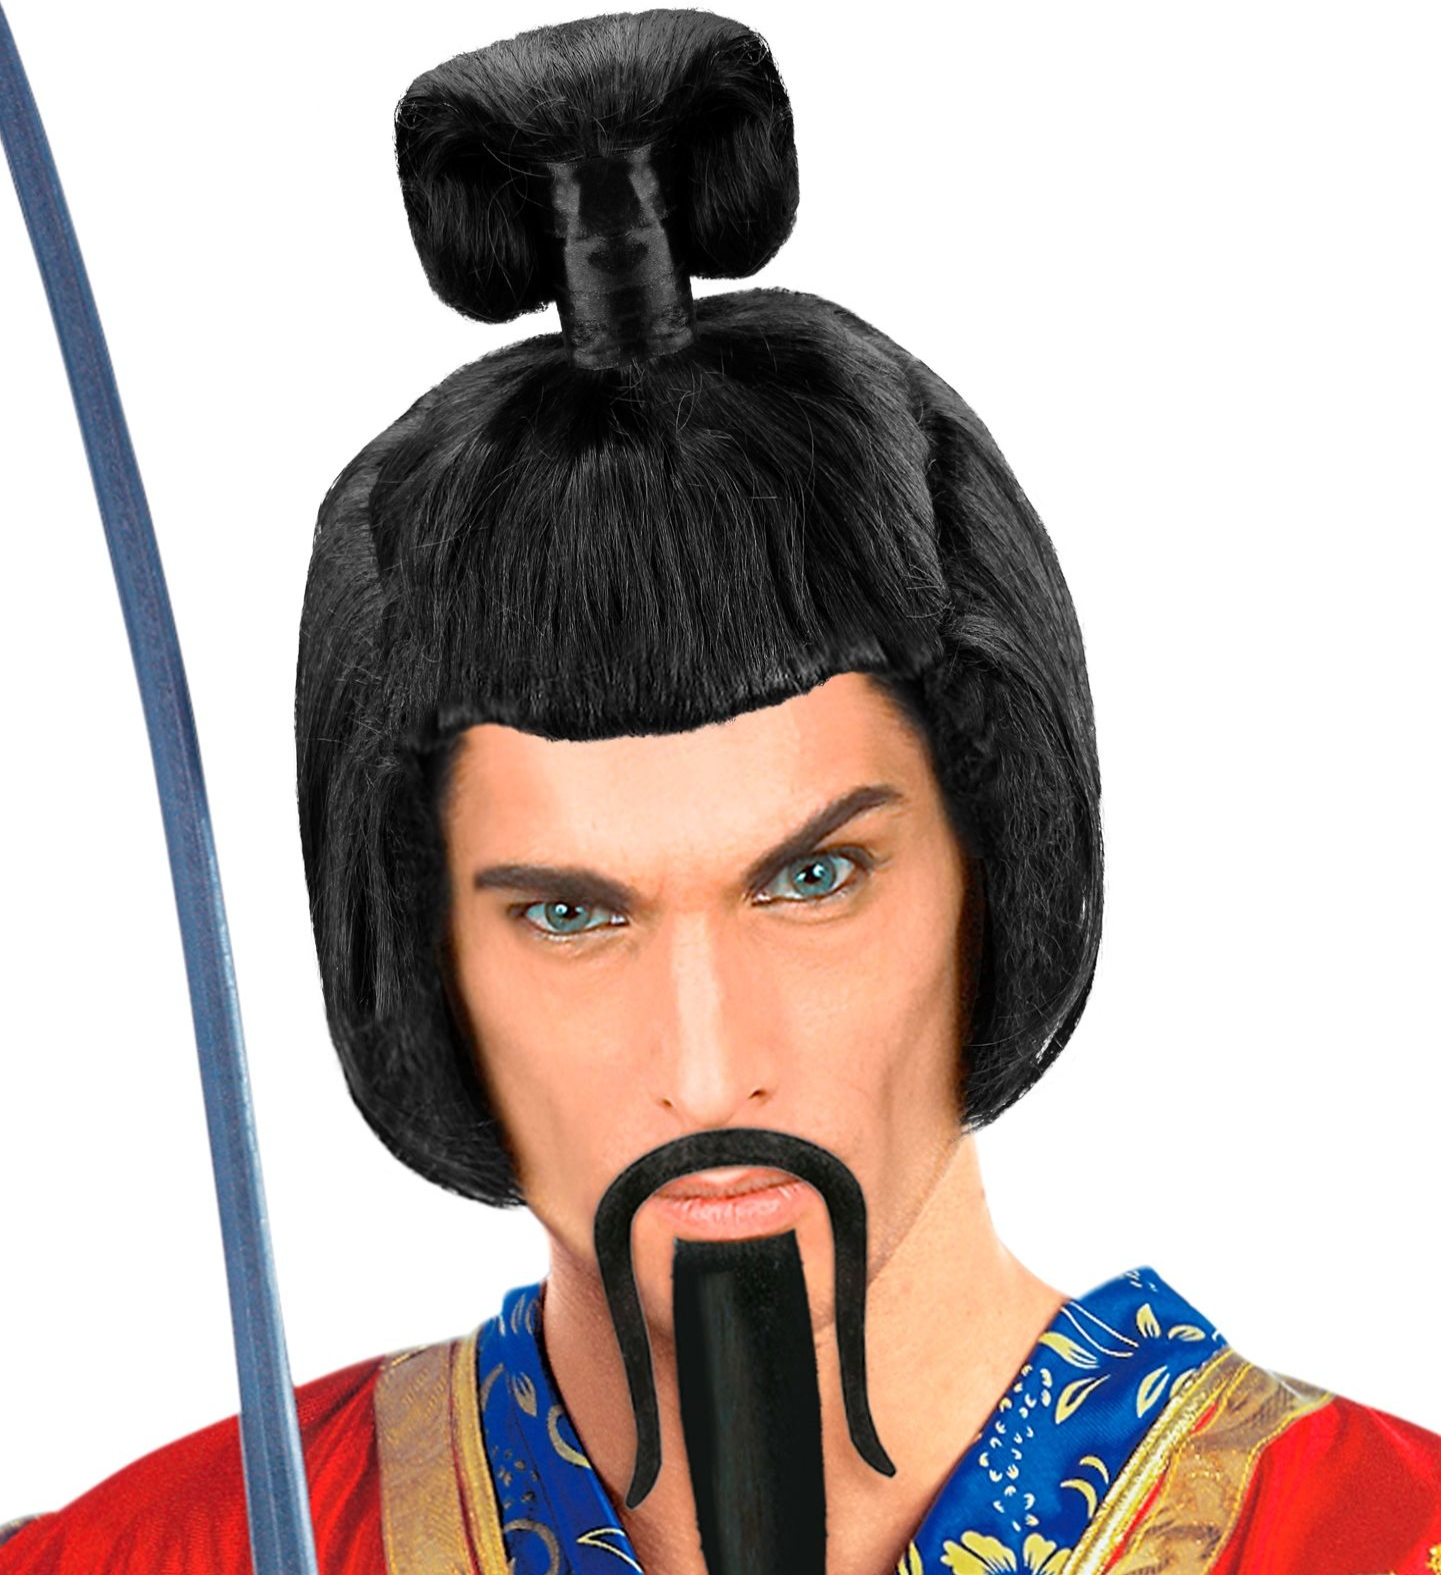 Samurai pruik